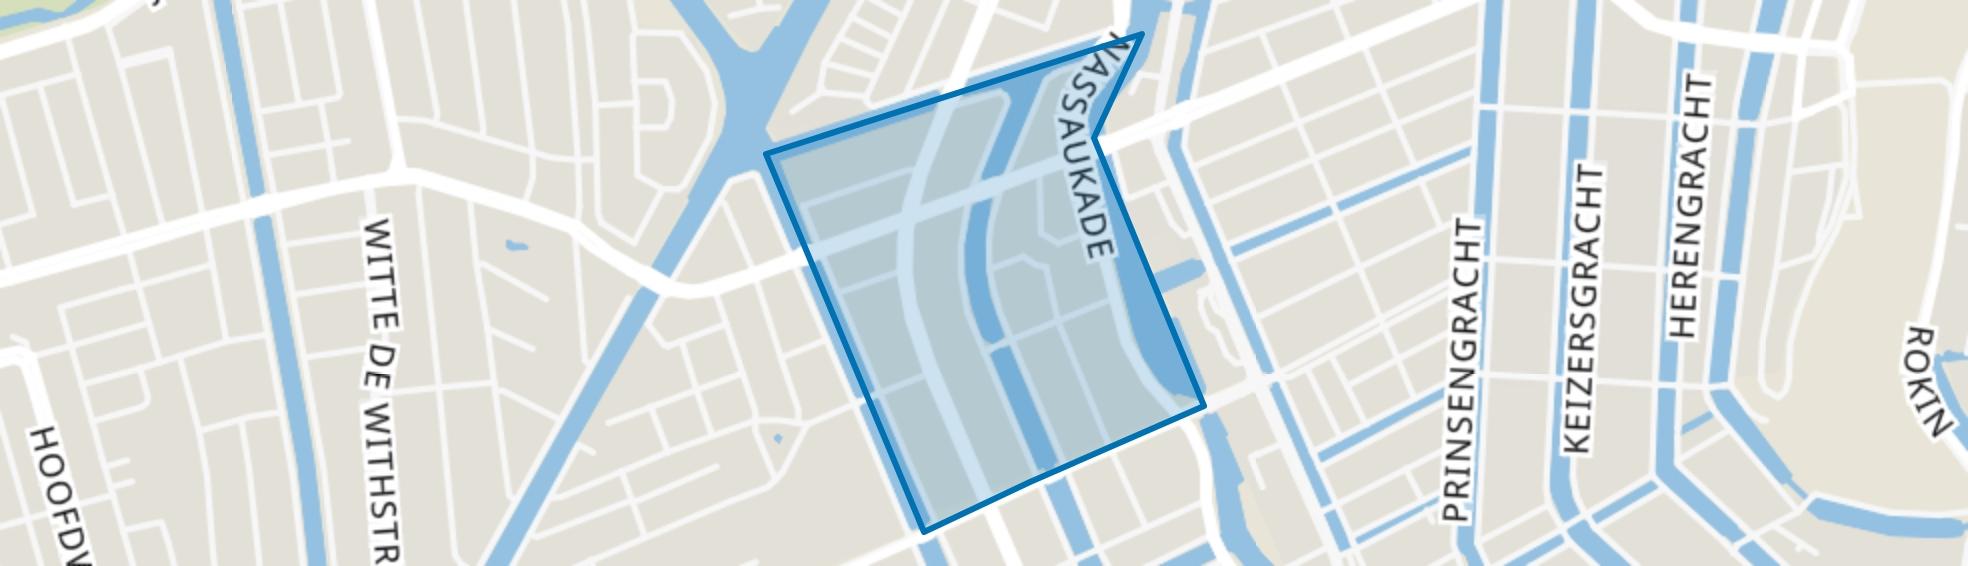 Da Costabuurt, Amsterdam map